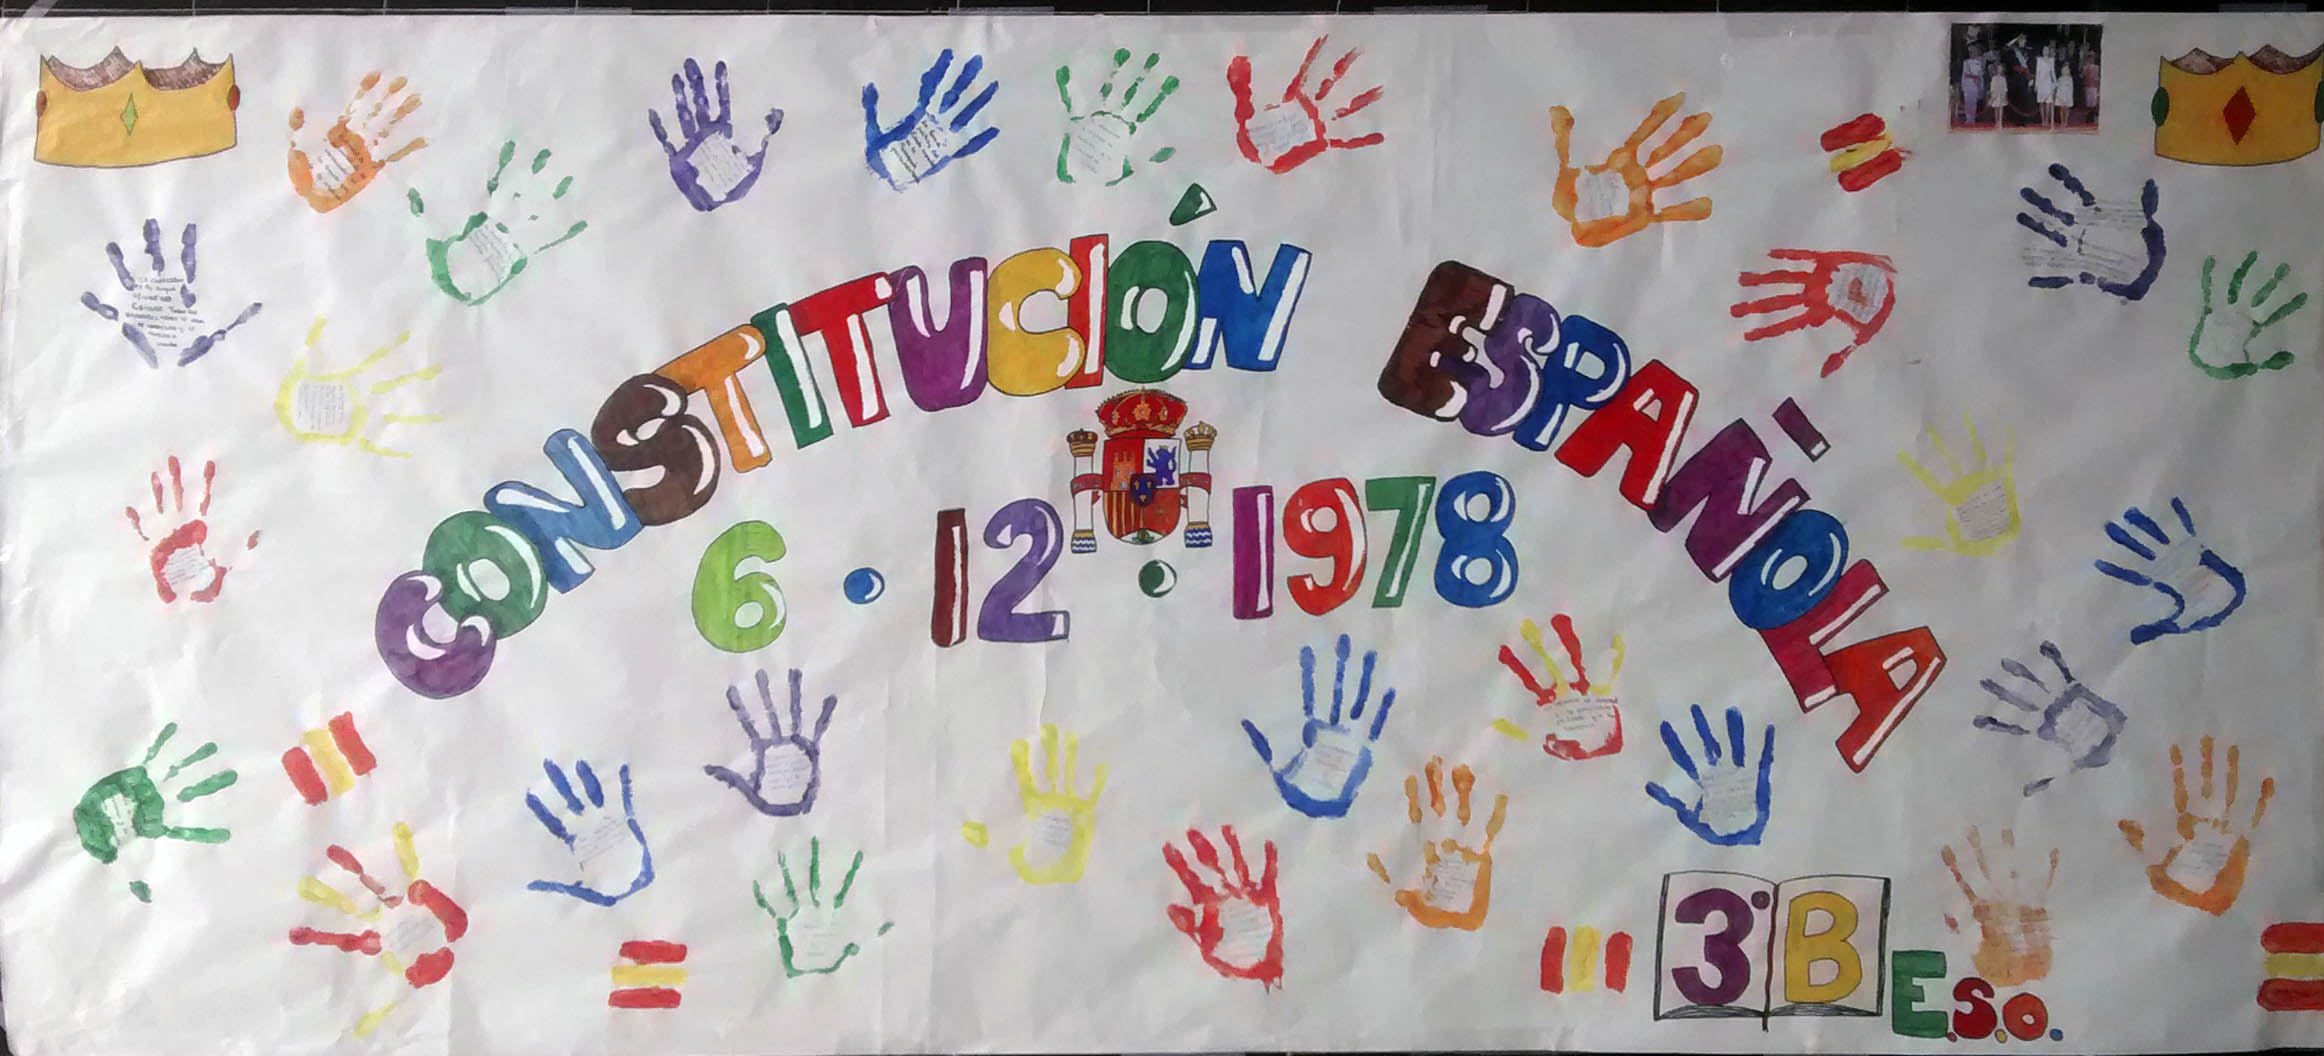 constitucion española colegio san jose espinardo